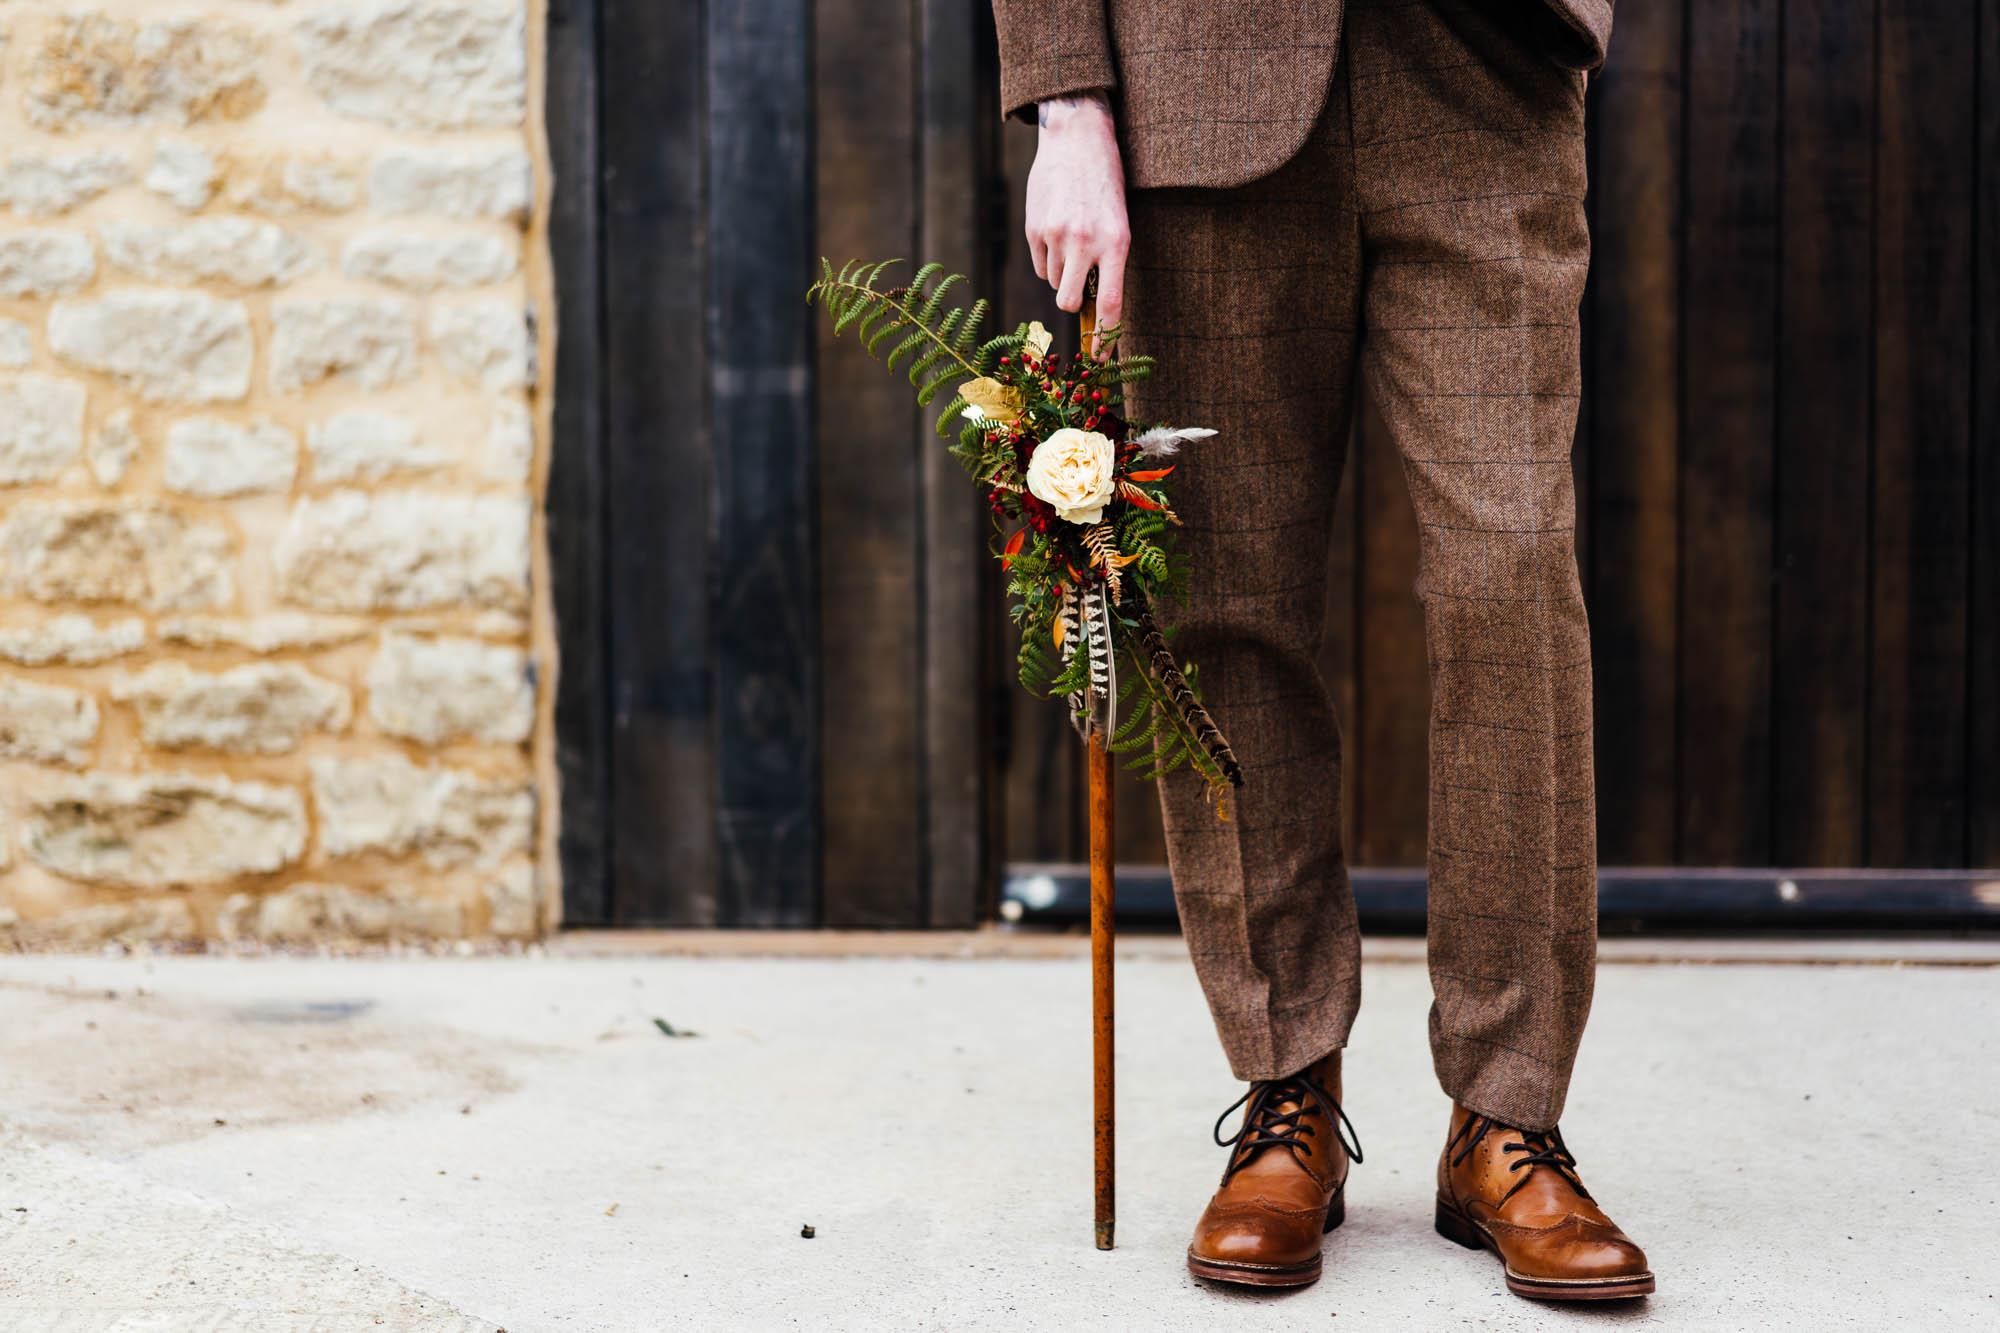 huntsmill-farm-wedding-inspiration-14